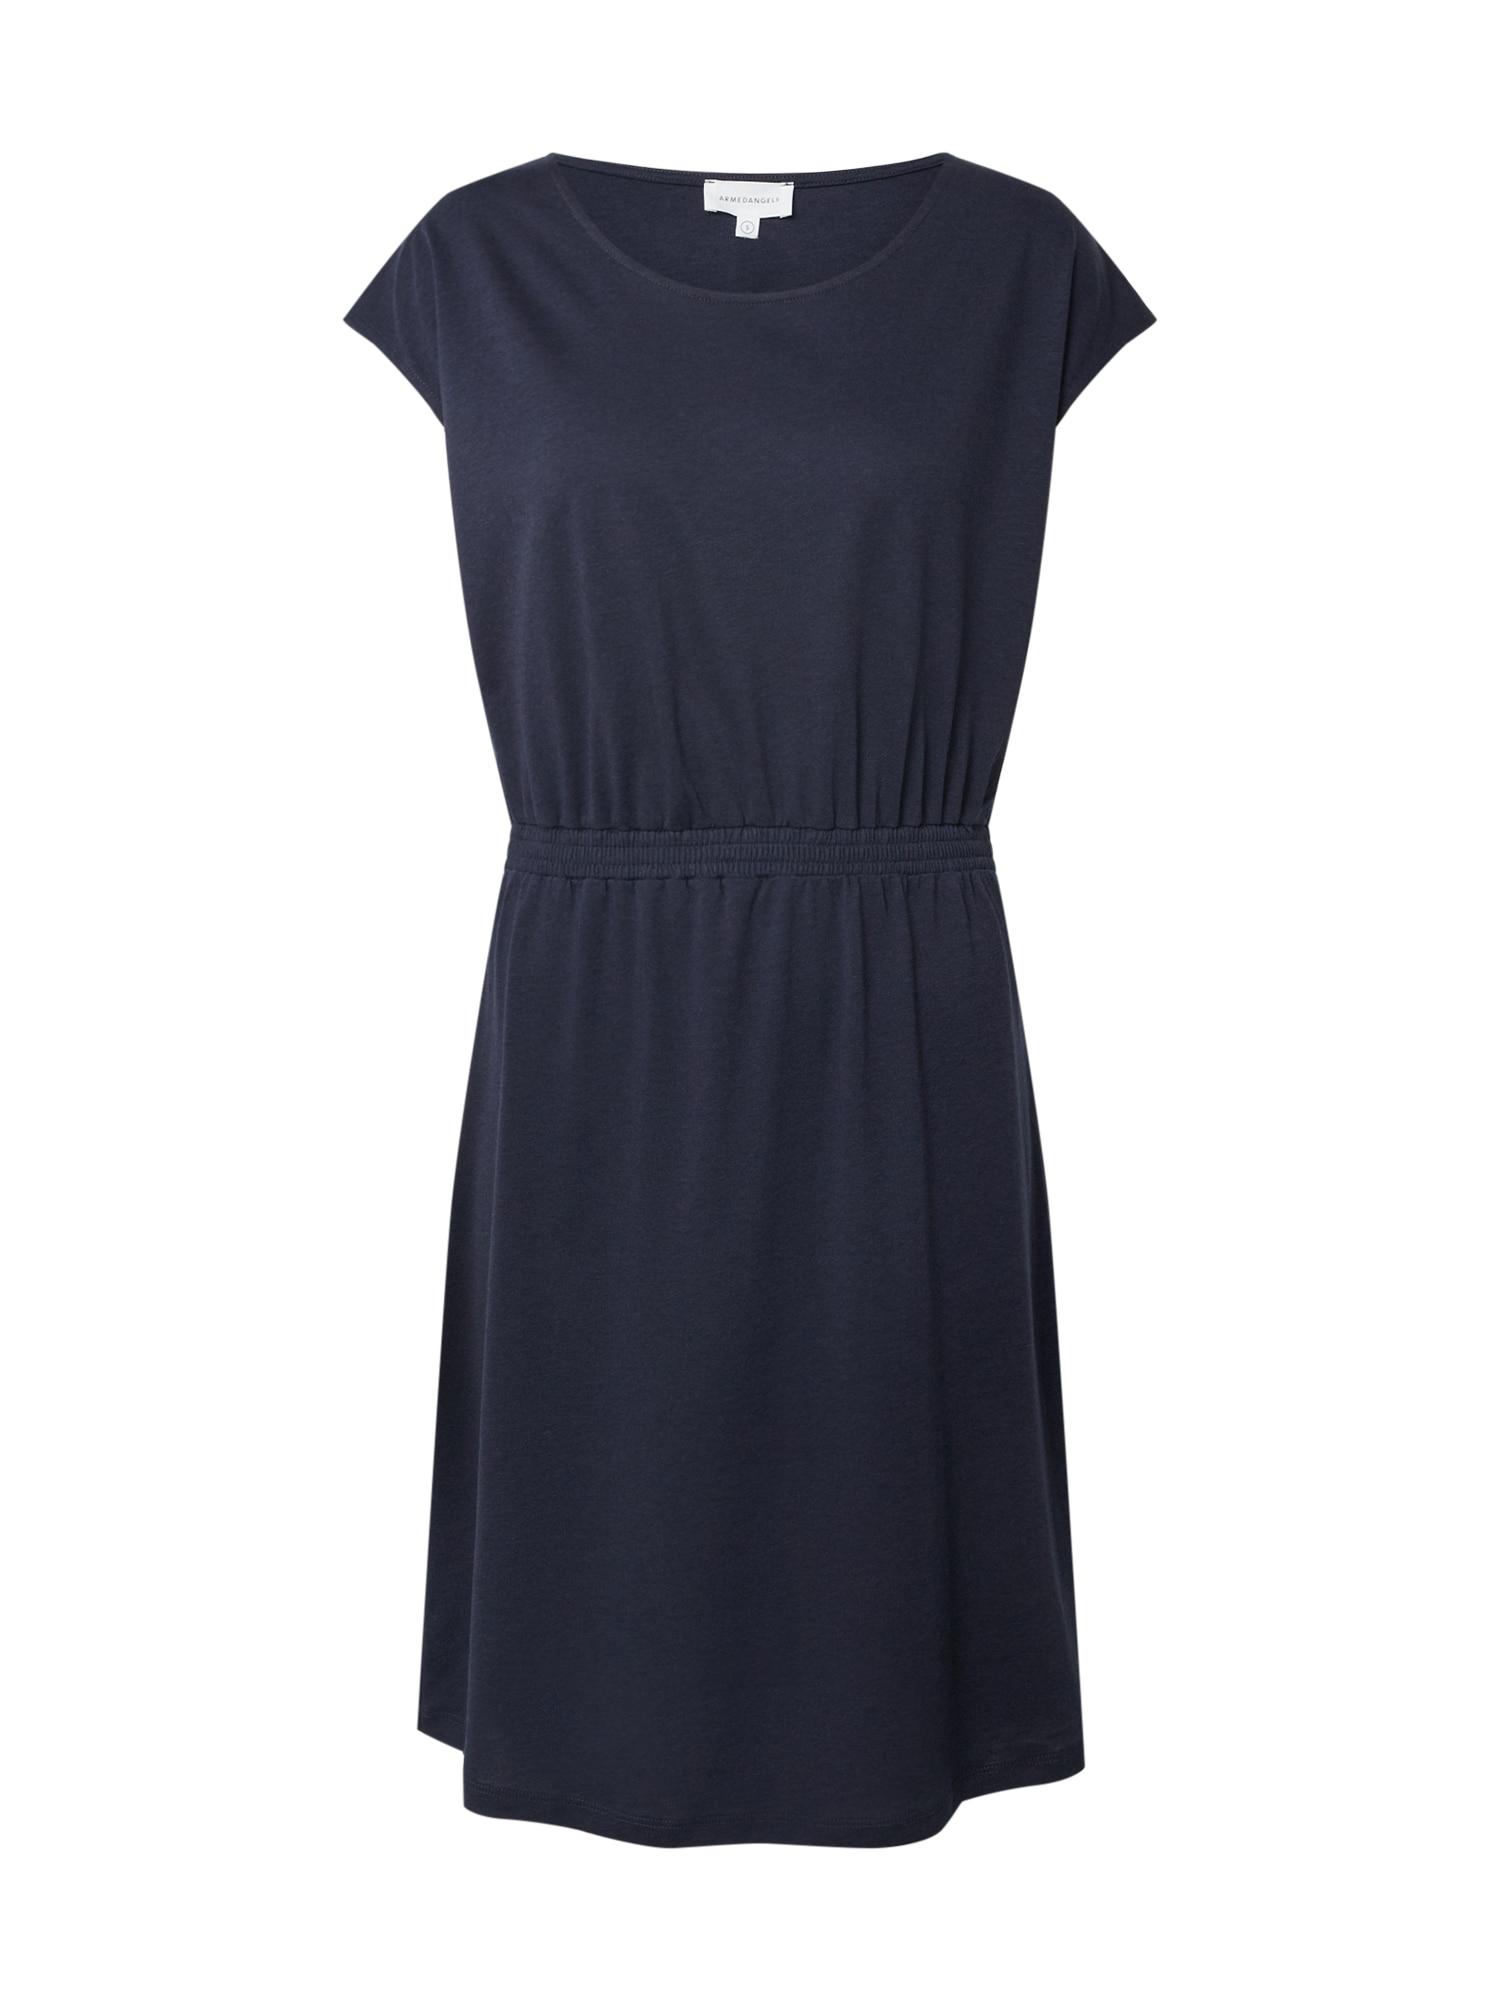 ARMEDANGELS Letní šaty 'Sonjaa'  tmavě modrá